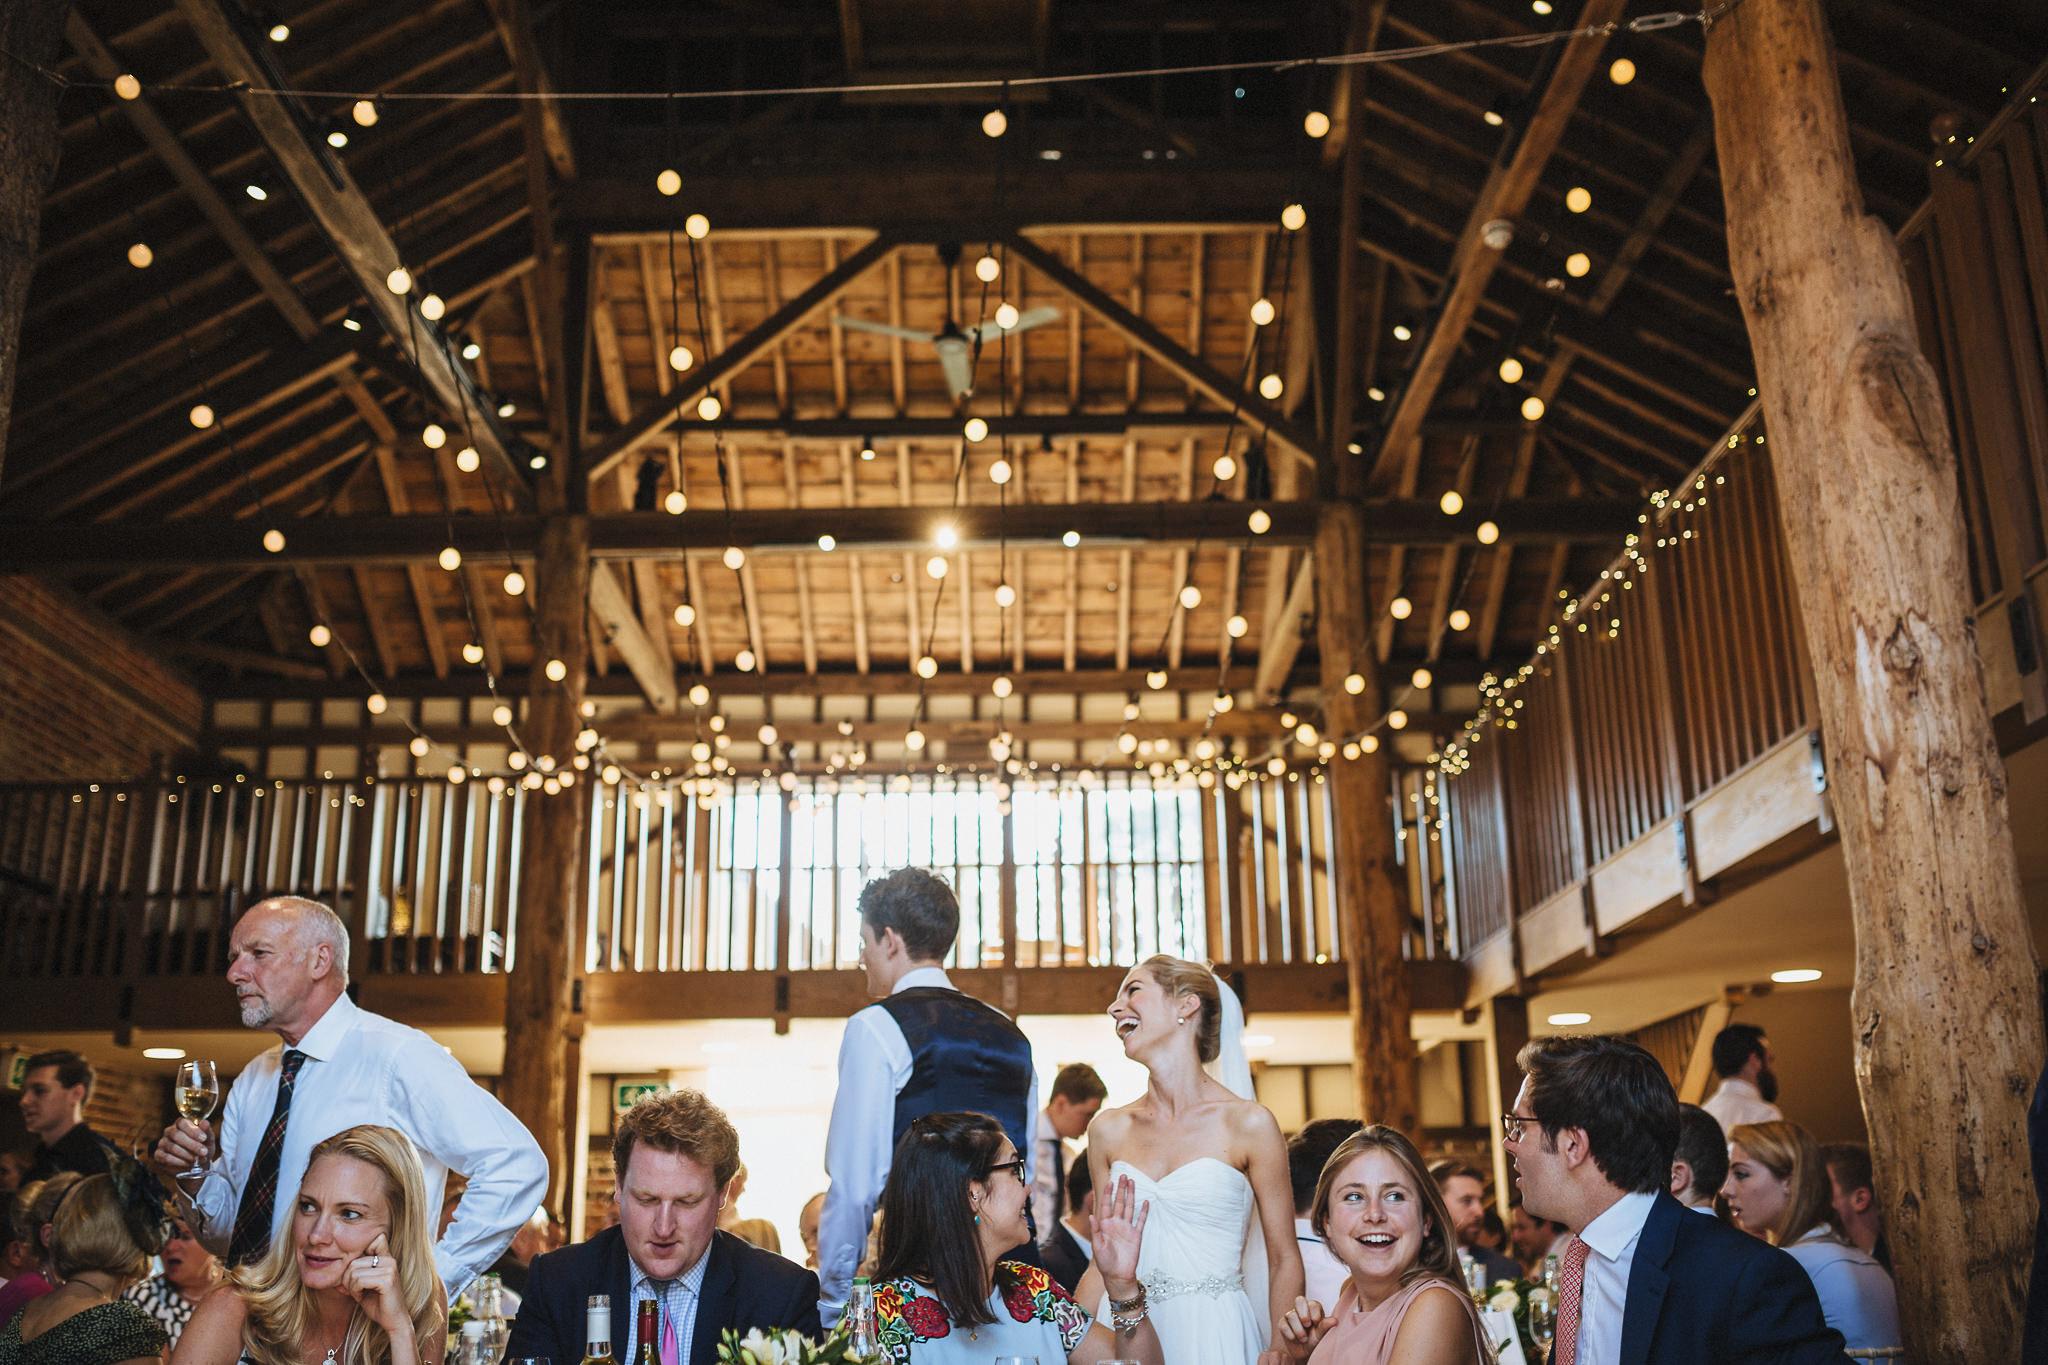 paul-marbrook-Gaynes-Park Wedding-Photographer-90107